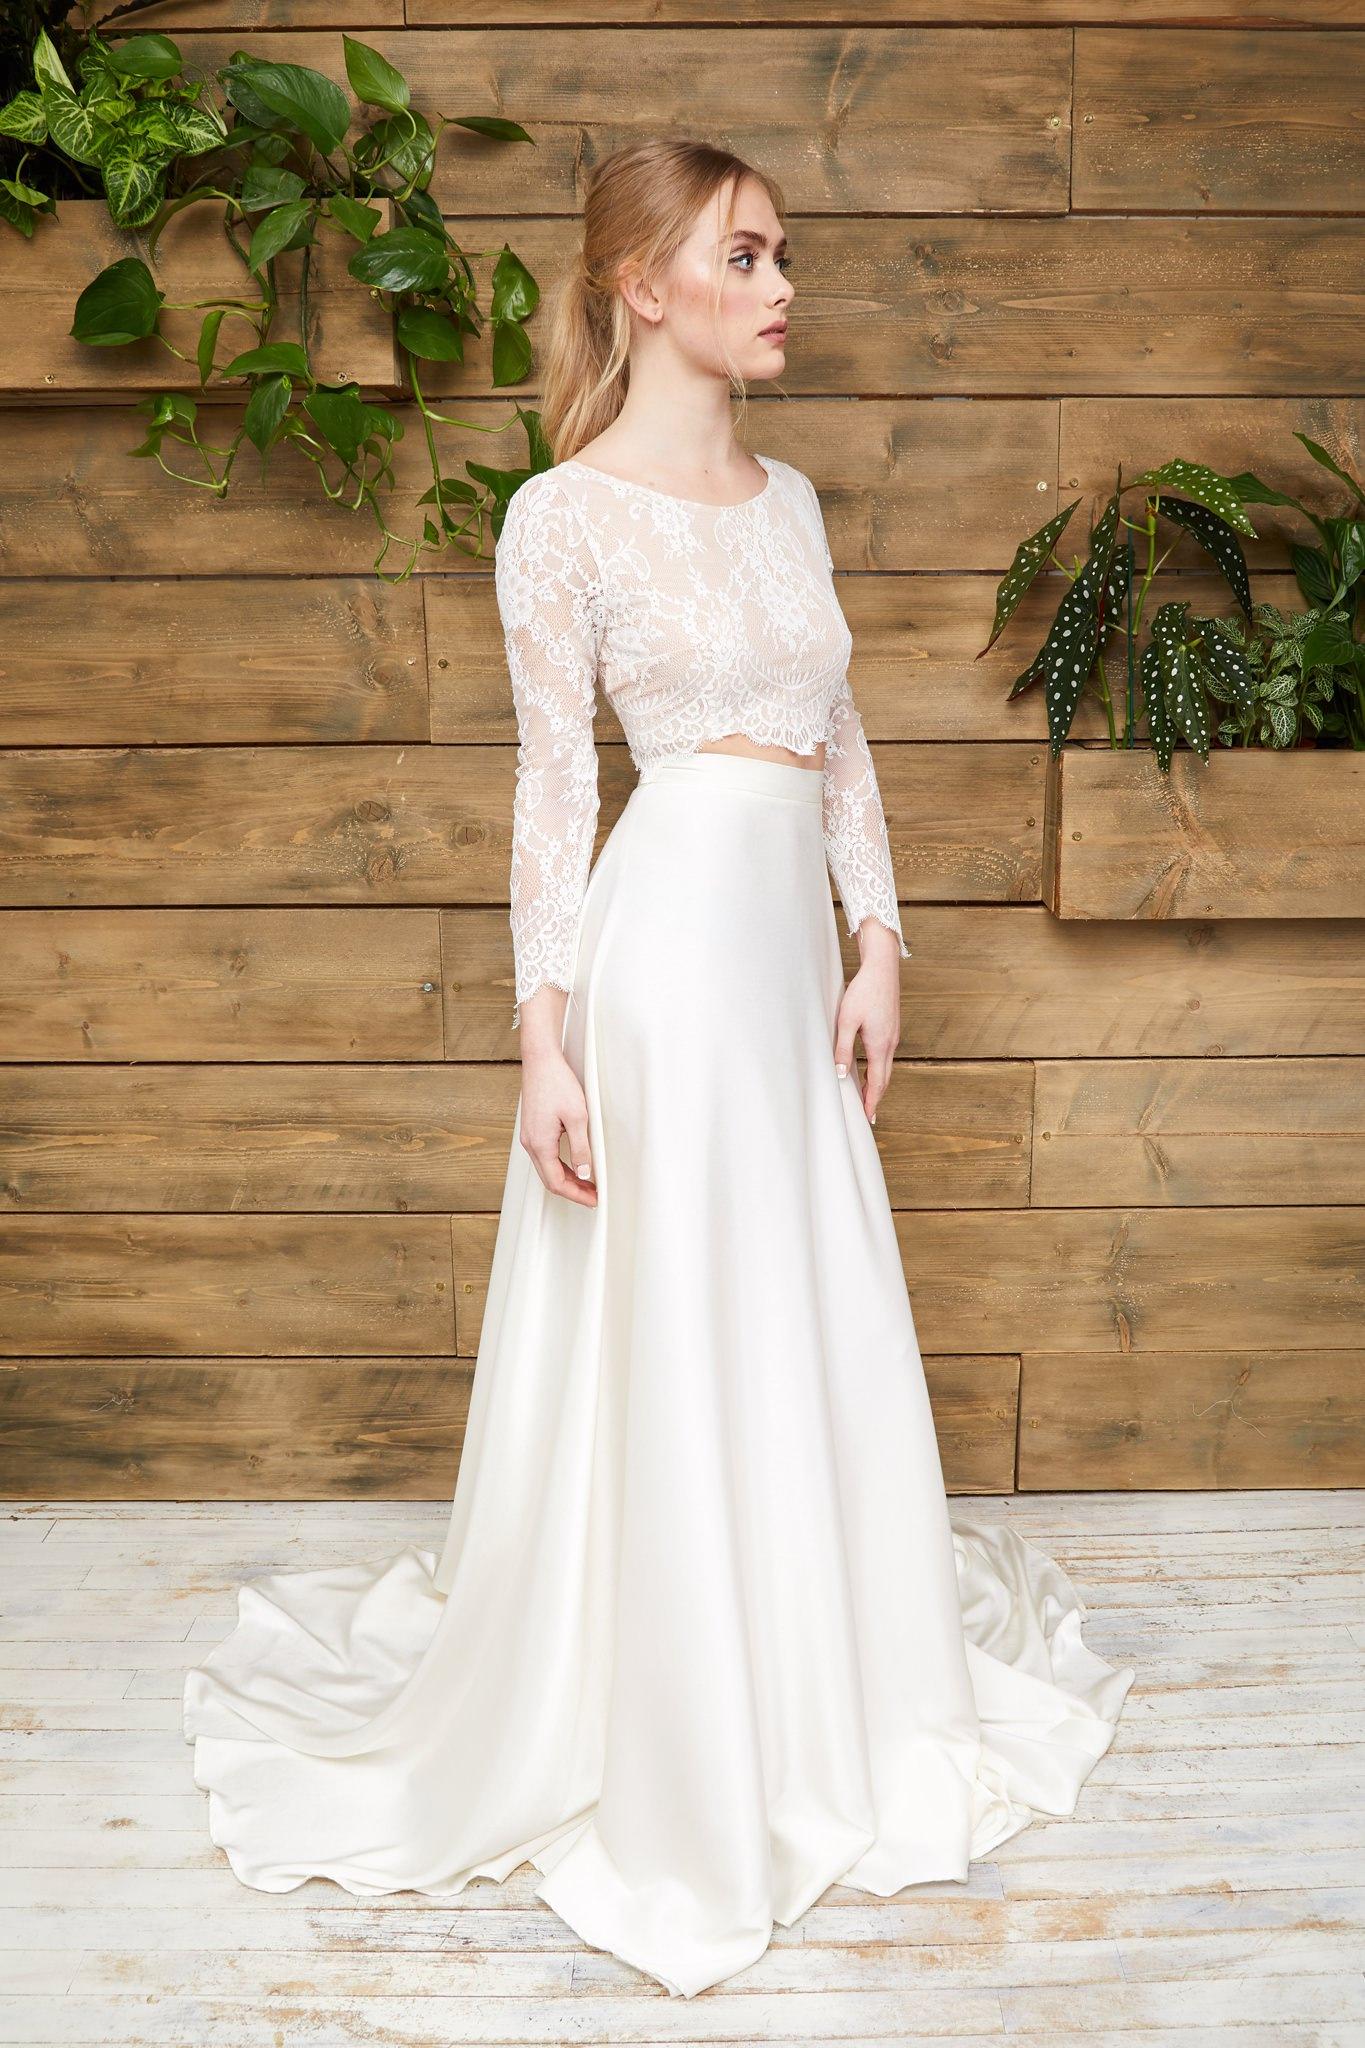 Rachel Burgess Bridal Boutique - Effy Crop & Olive Skirt.jpg